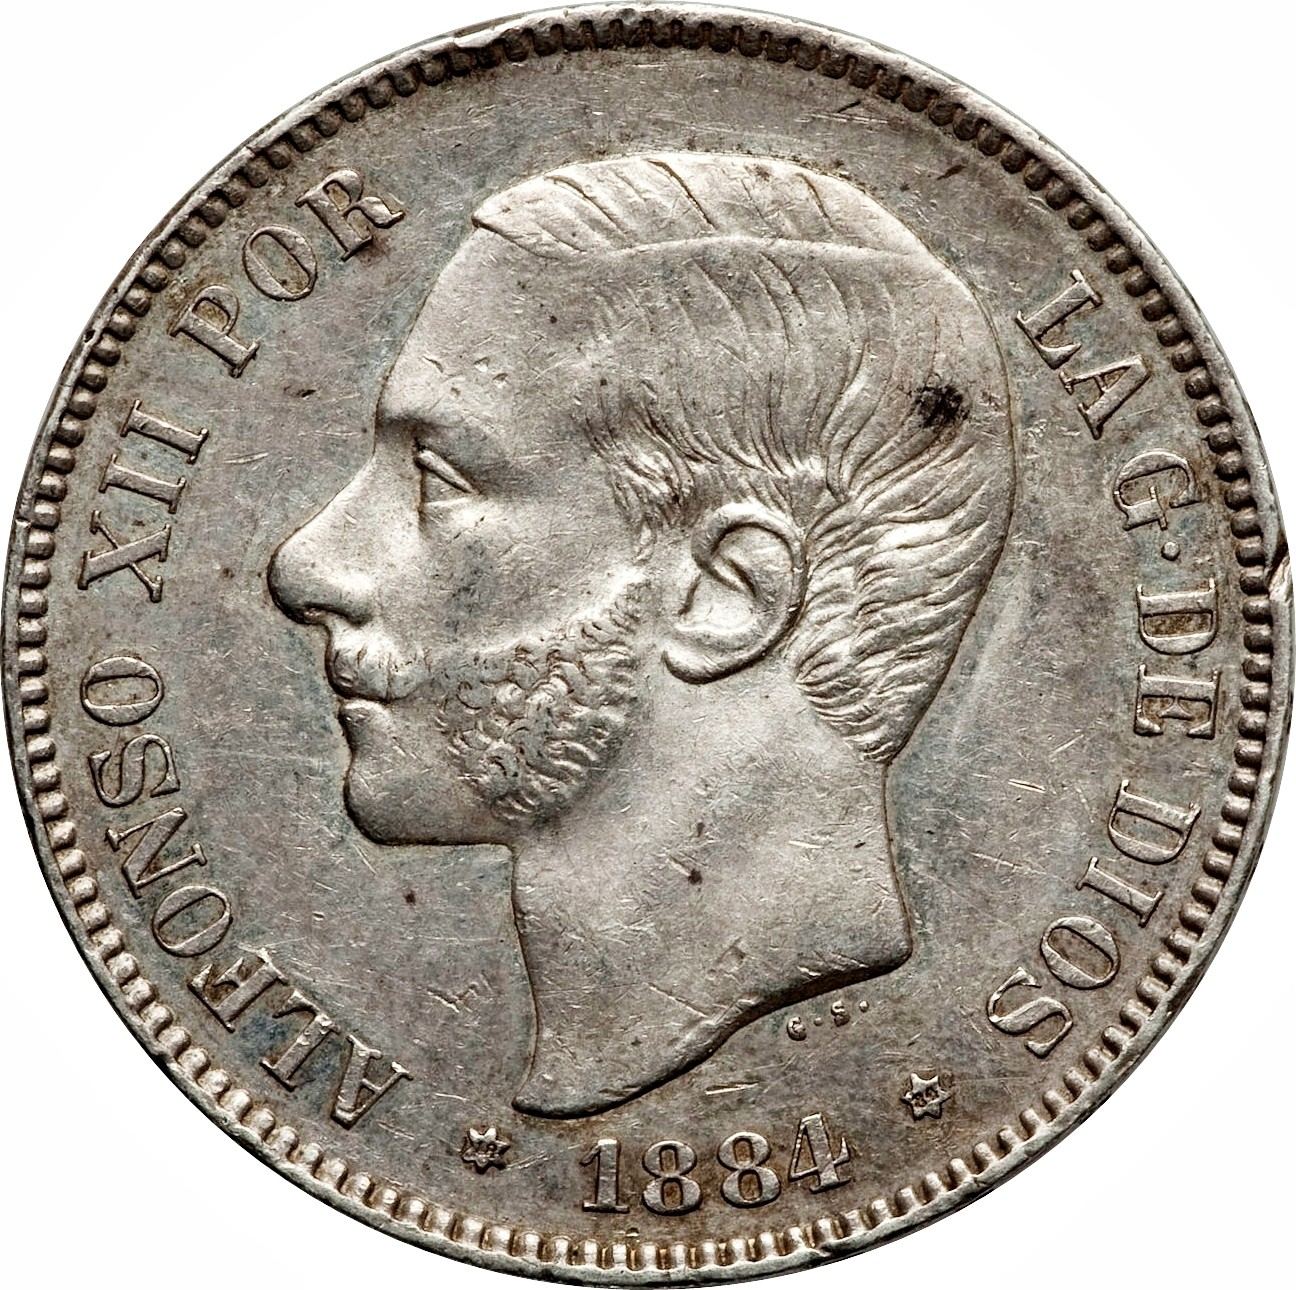 Spain 5 Pesetas (1882-1885 Alfonso XII)